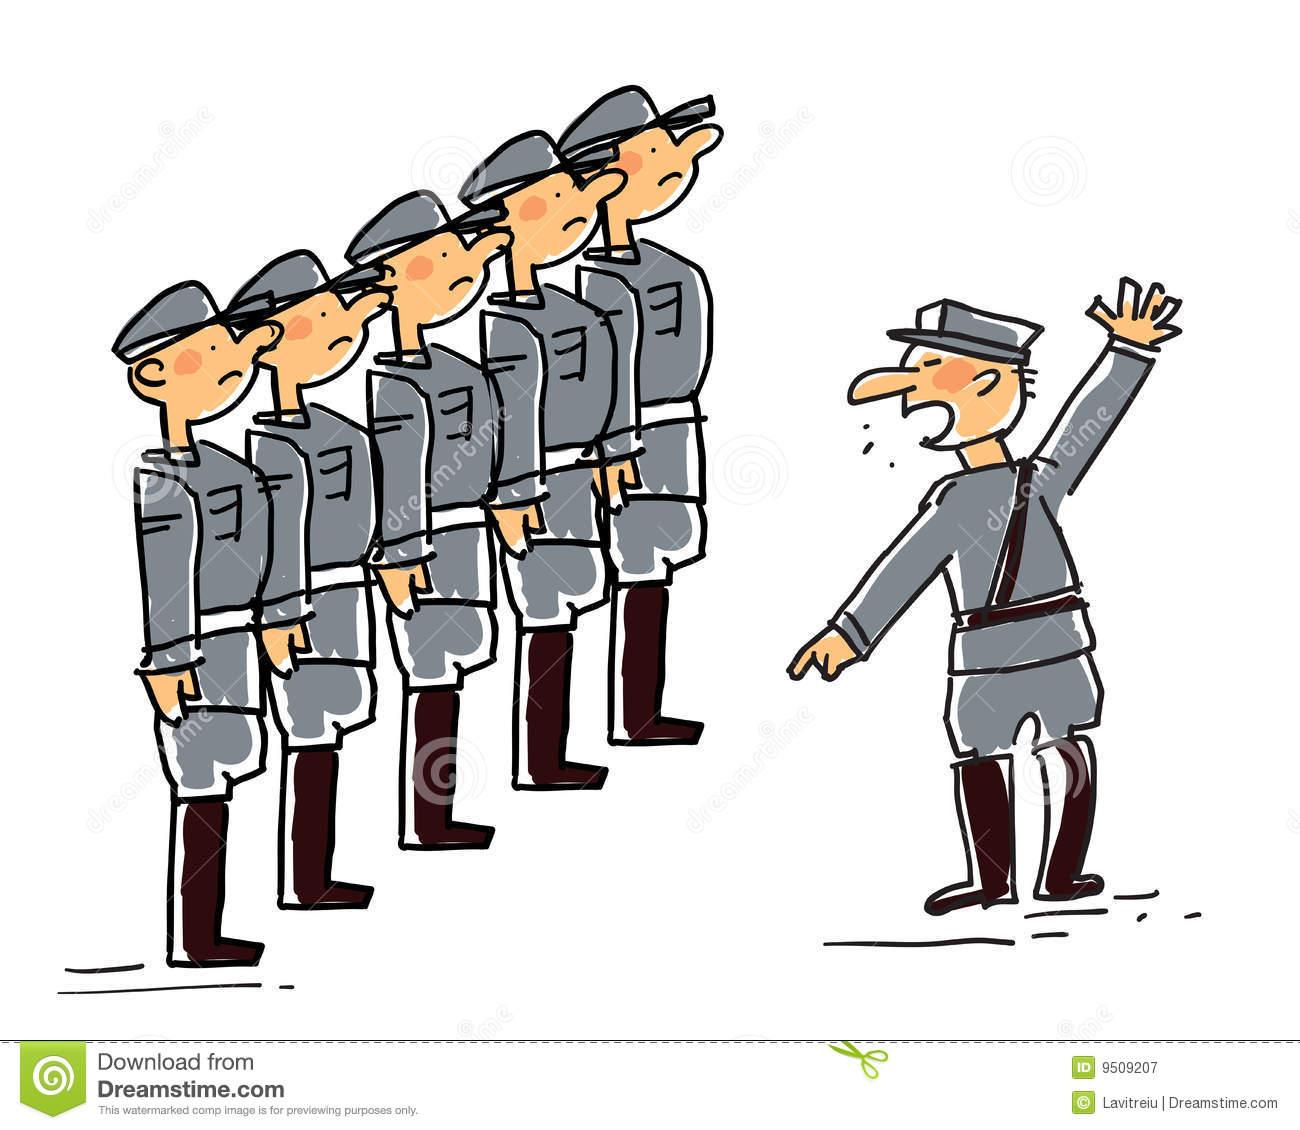 Army clipart army man. Impressive military illustration megapixl